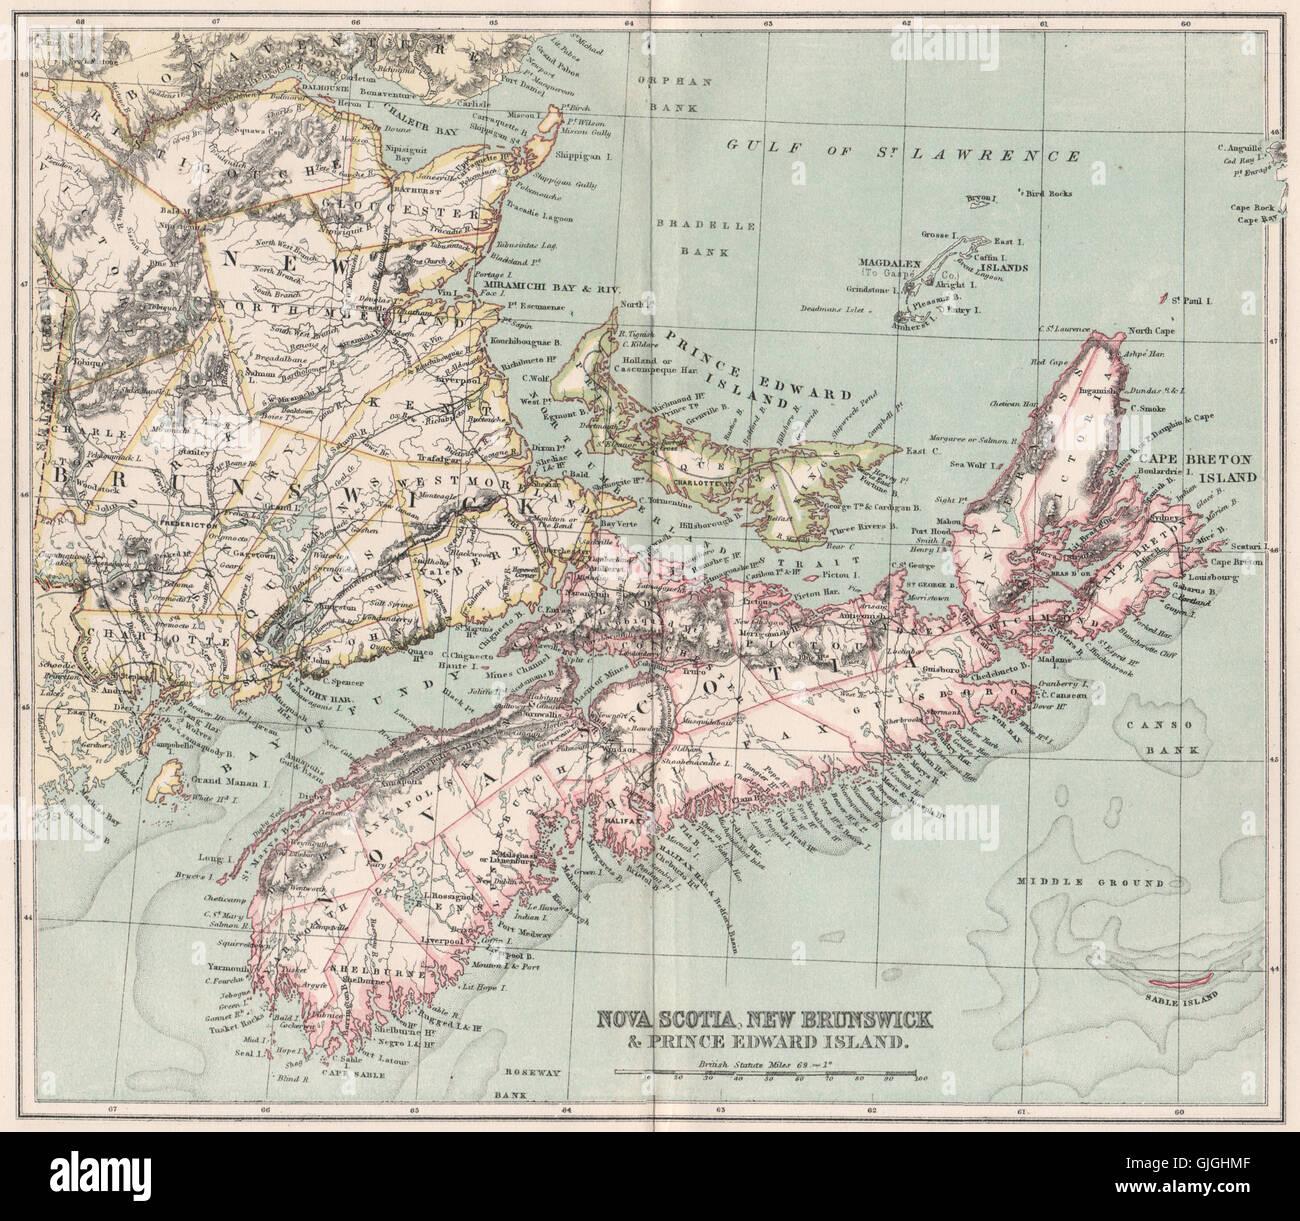 Nova Scotia New Brunswick Prince Edward Island Canada